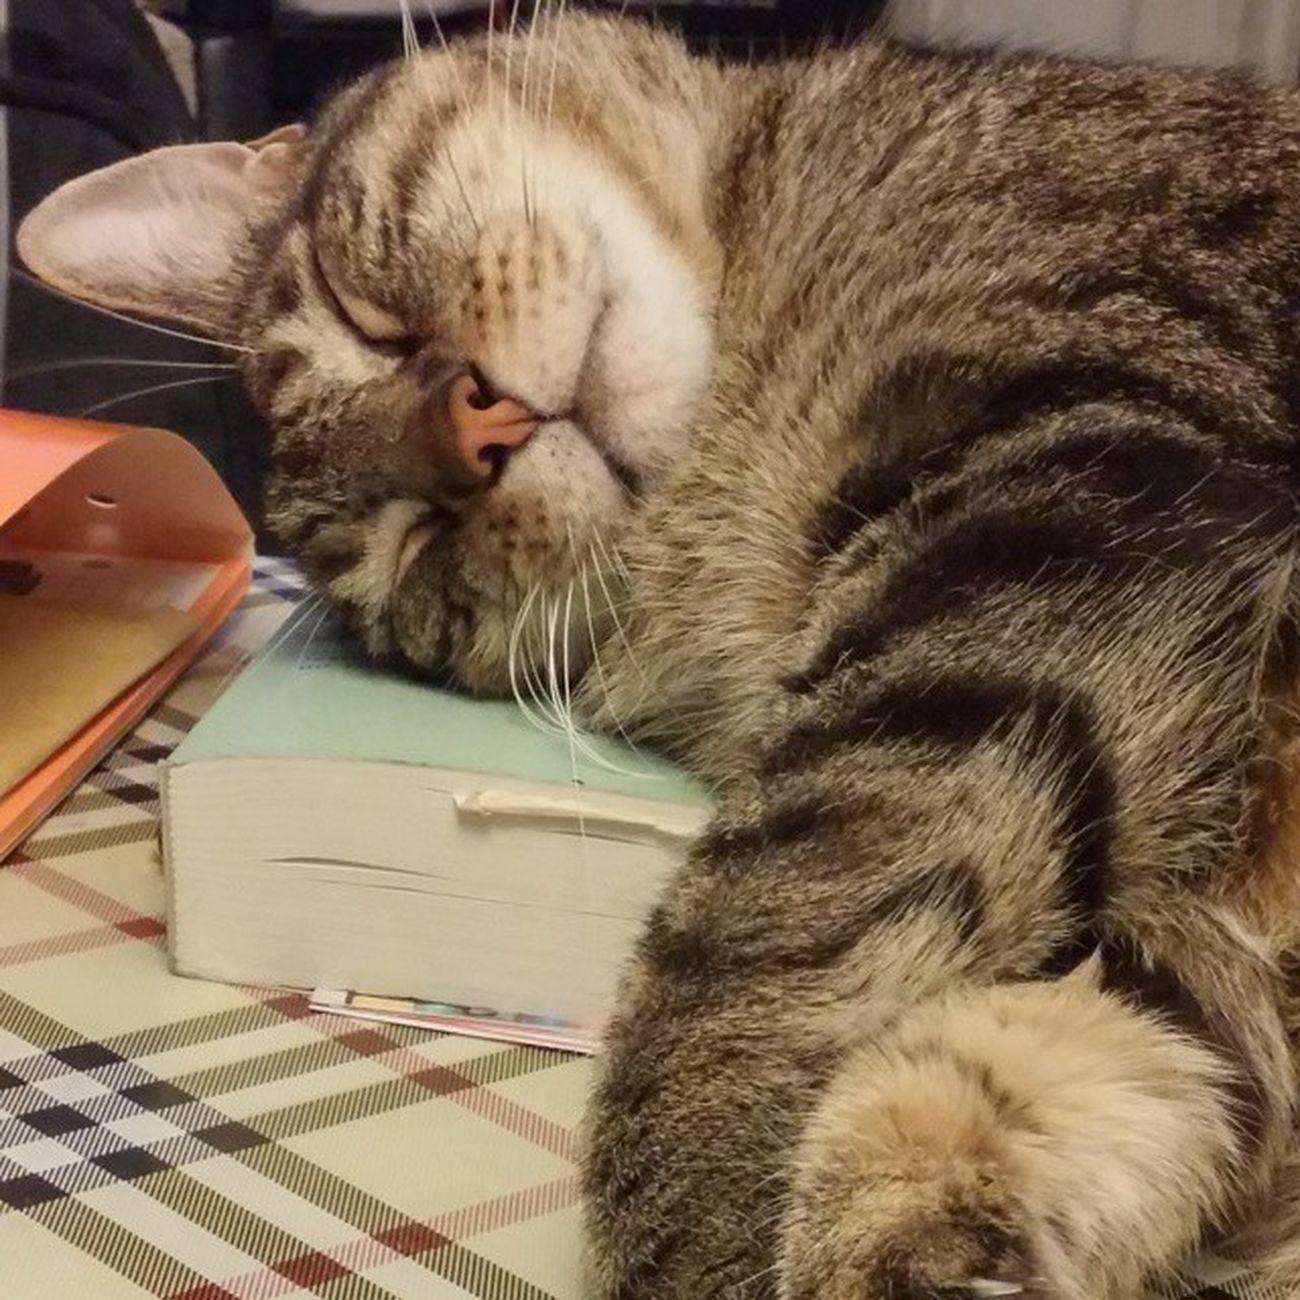 Cat Catsofinstagram Pet Sleepingcat Bookpillow Kali Cute Cuteness TabbyCat Tabby Igerscats Kissa Gato World_kawaii_cat Igcutest_animals